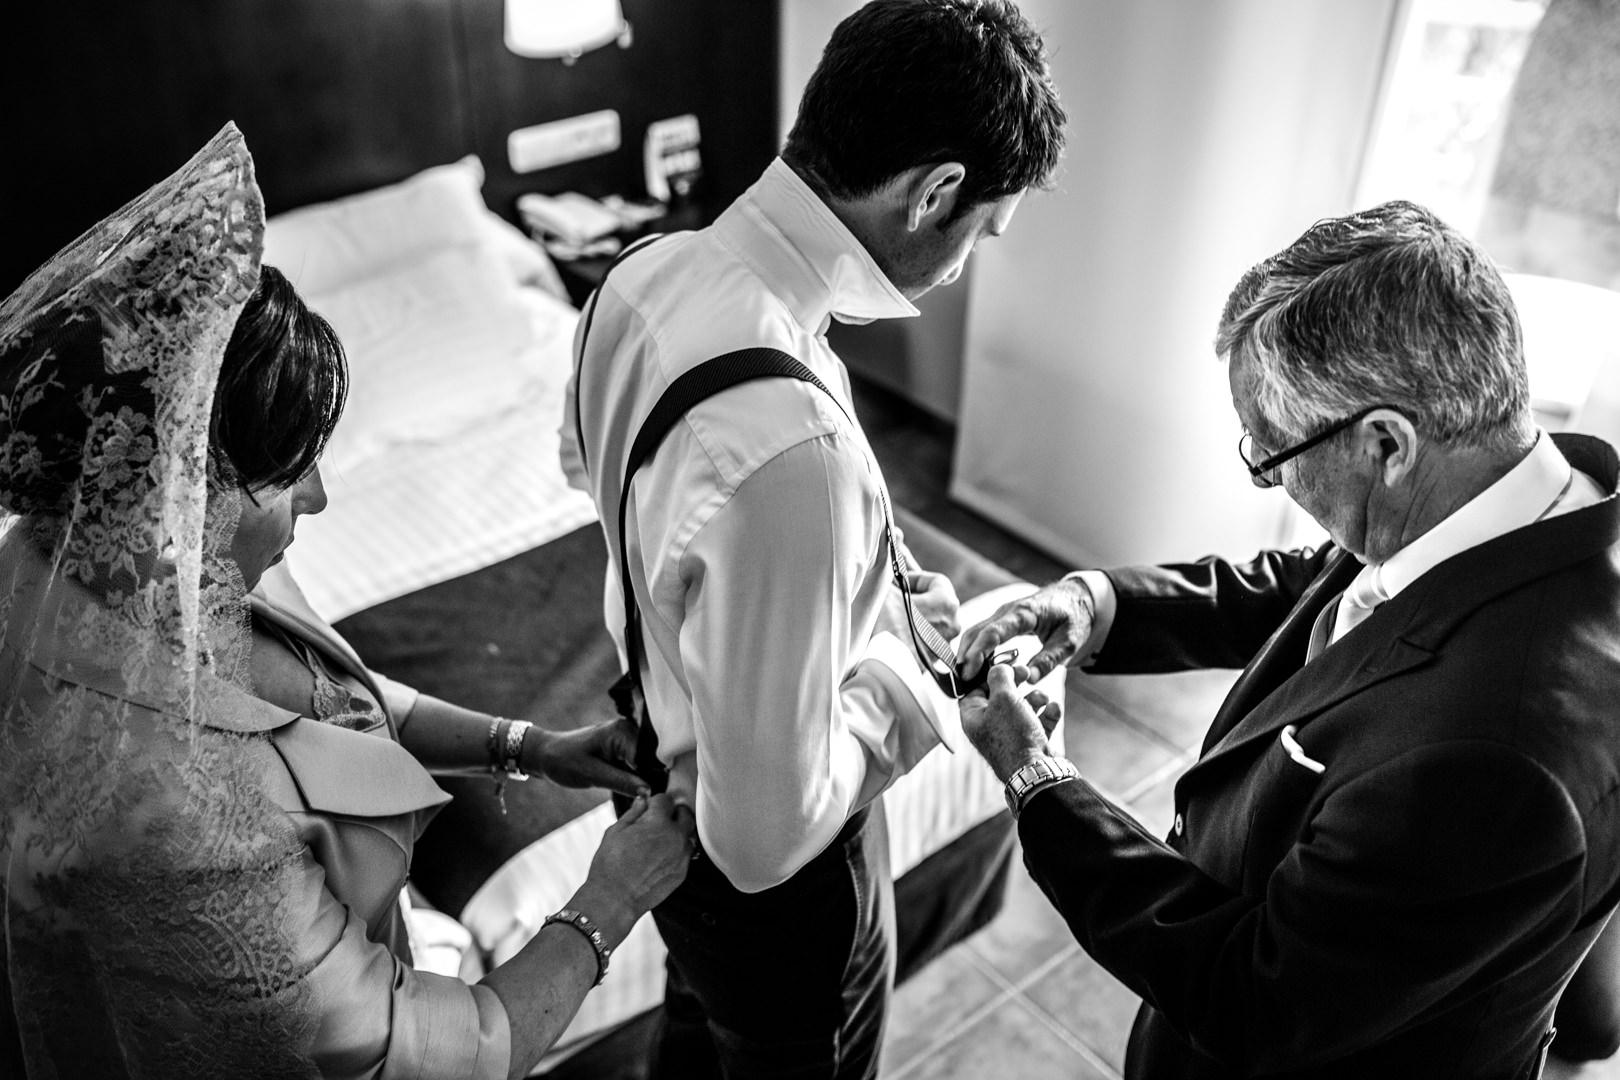 Boda-Catedral-Jaen-Hamburgo-Maria-David-engagement-Rafael-Torres-fotografo-bodas-sevilla-madrid-barcelona-wedding-photographer--6.jpg